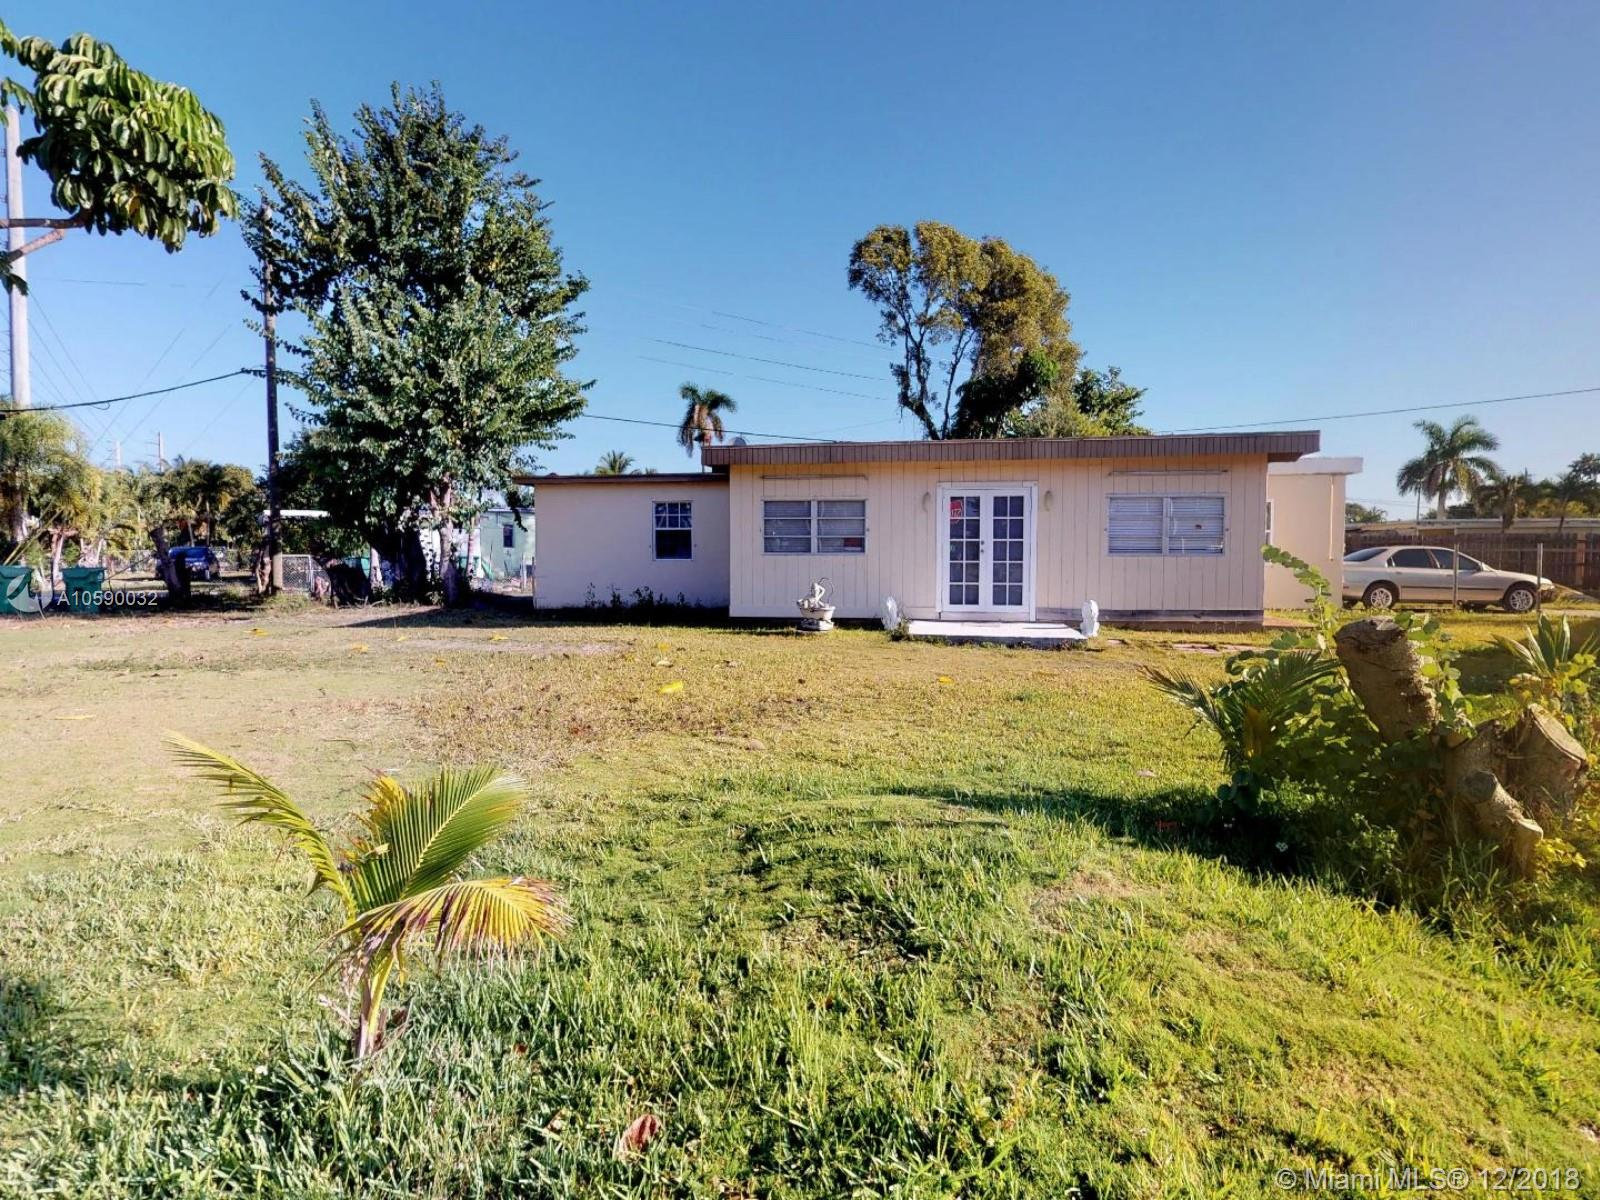 29045 SW 157th Ave, Homestead, FL 33033 - Homestead, FL real estate listing